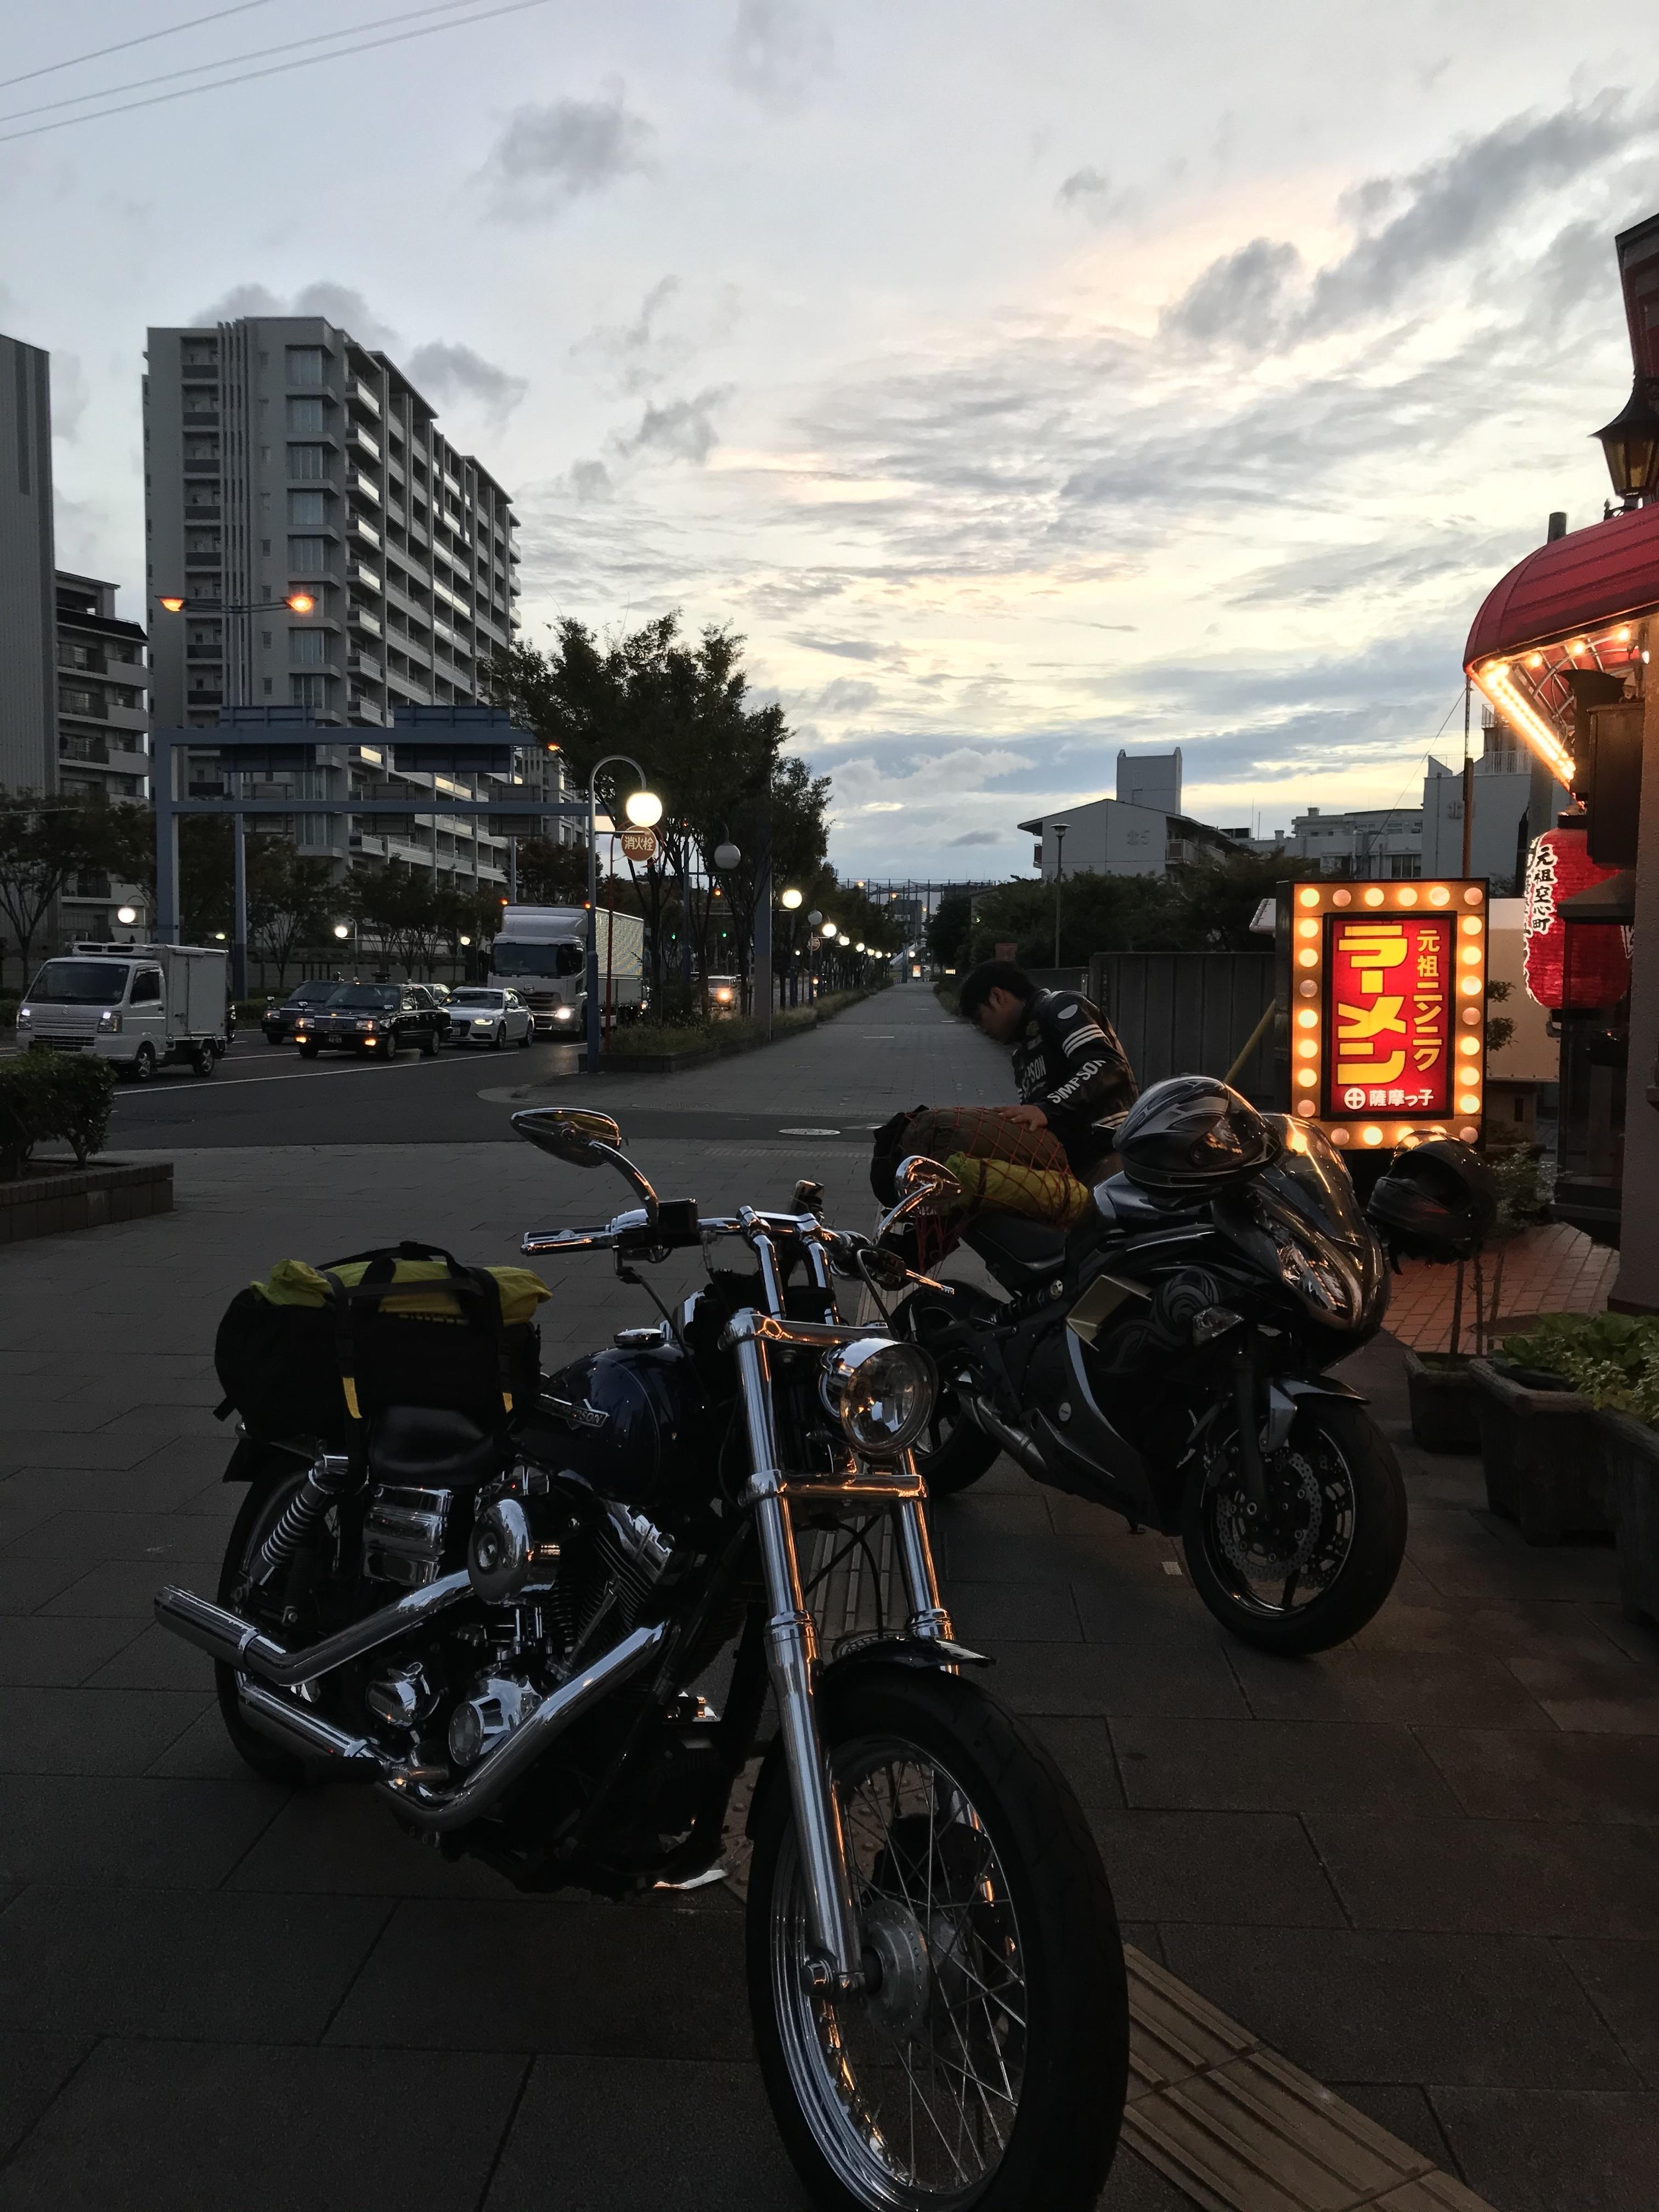 harleydavidson-dyna-capemuroto-motorcycle-touring-ramen-3.jpg